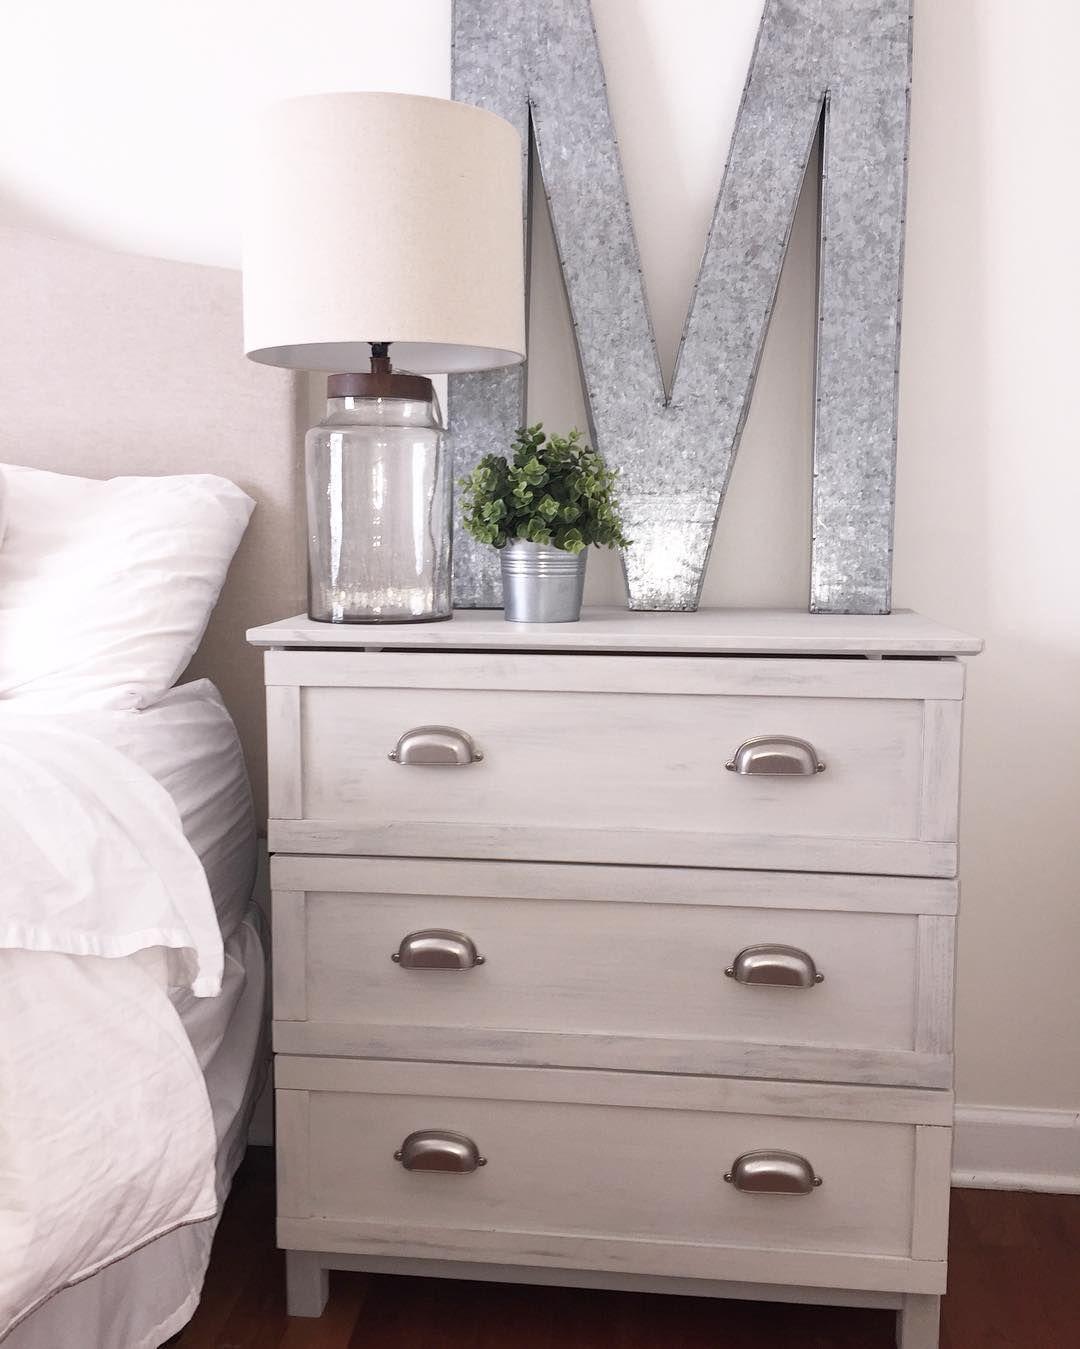 Bedroom Dresser Decor: Pin By Heidi Lindsay On Nightstands